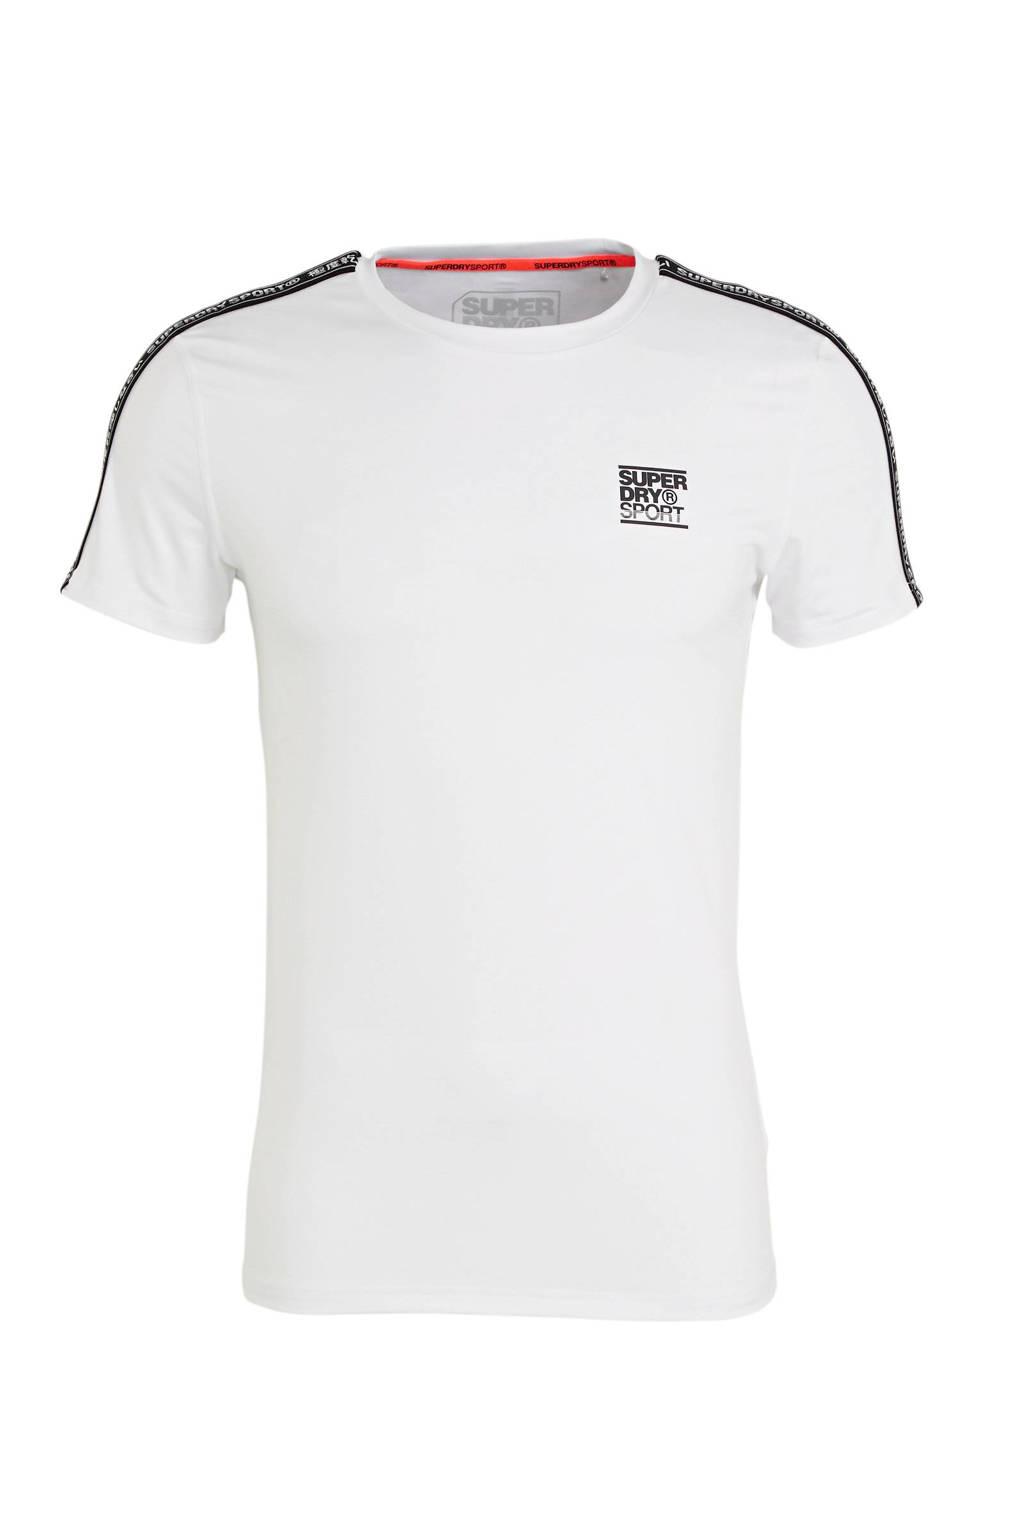 Superdry Sport   sport T-shirt wit, Wit